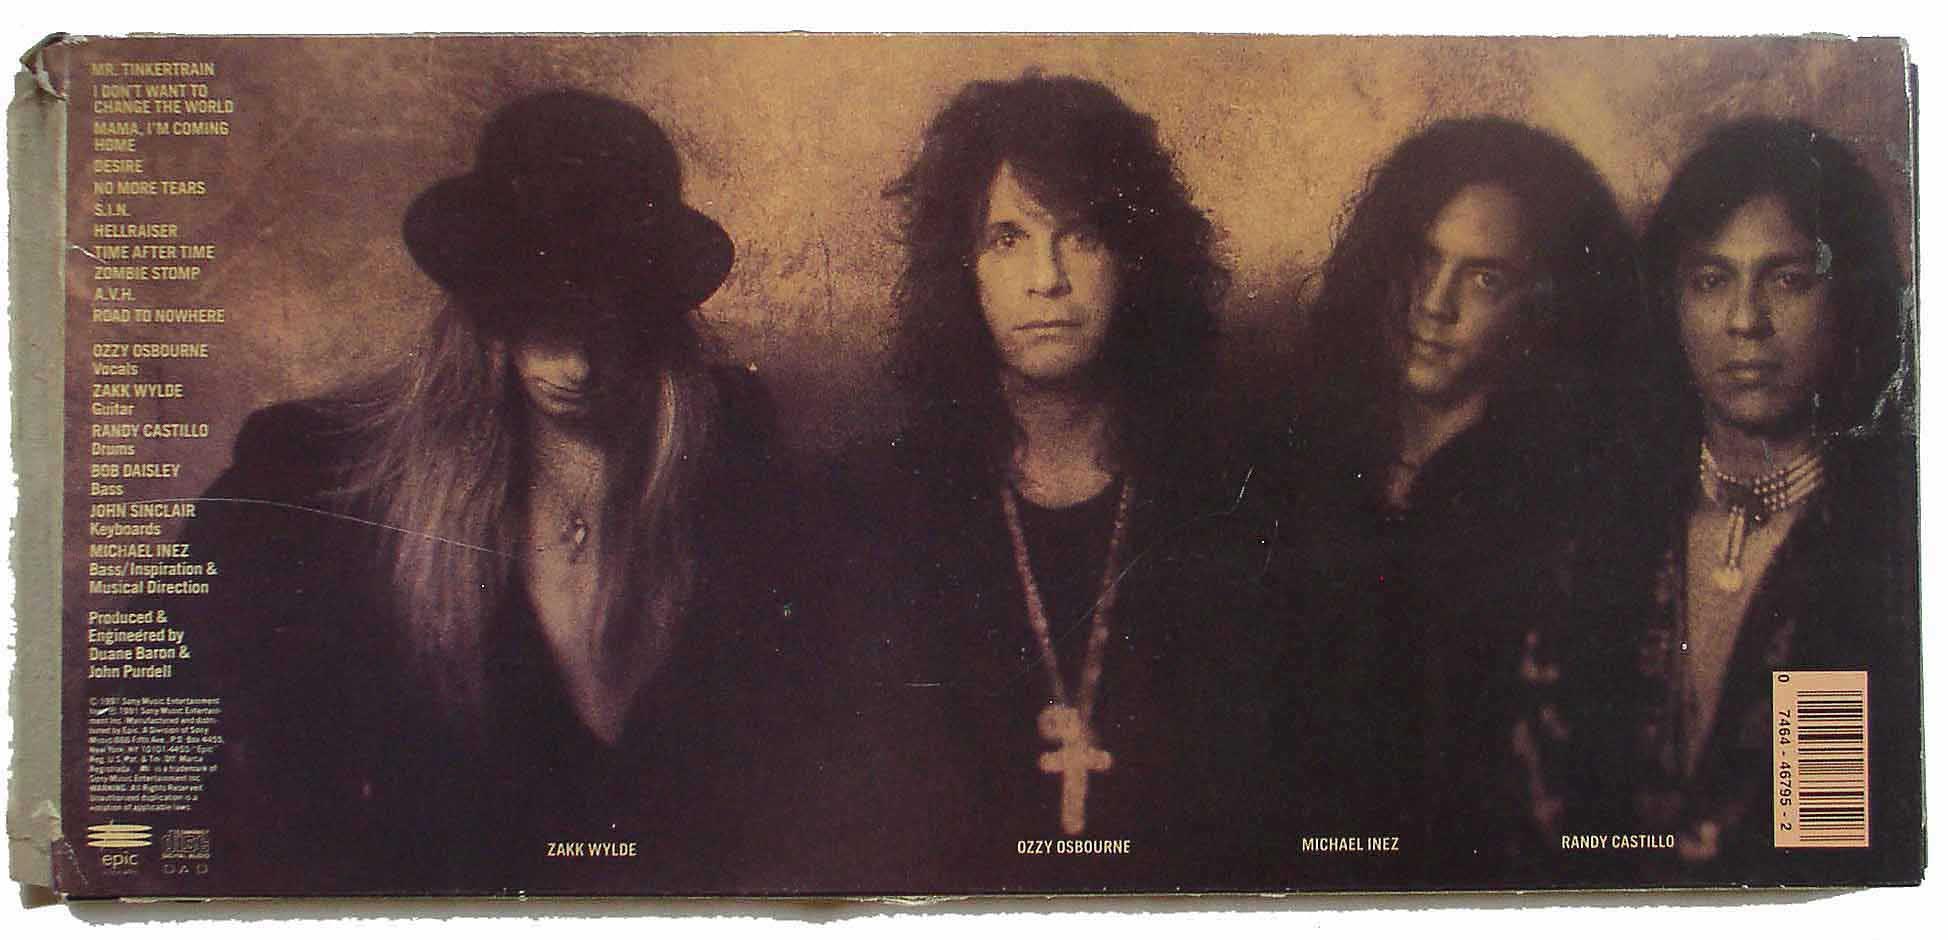 Ozzy Osbourne / No More Tears – Thingery Previews Postviews & Music